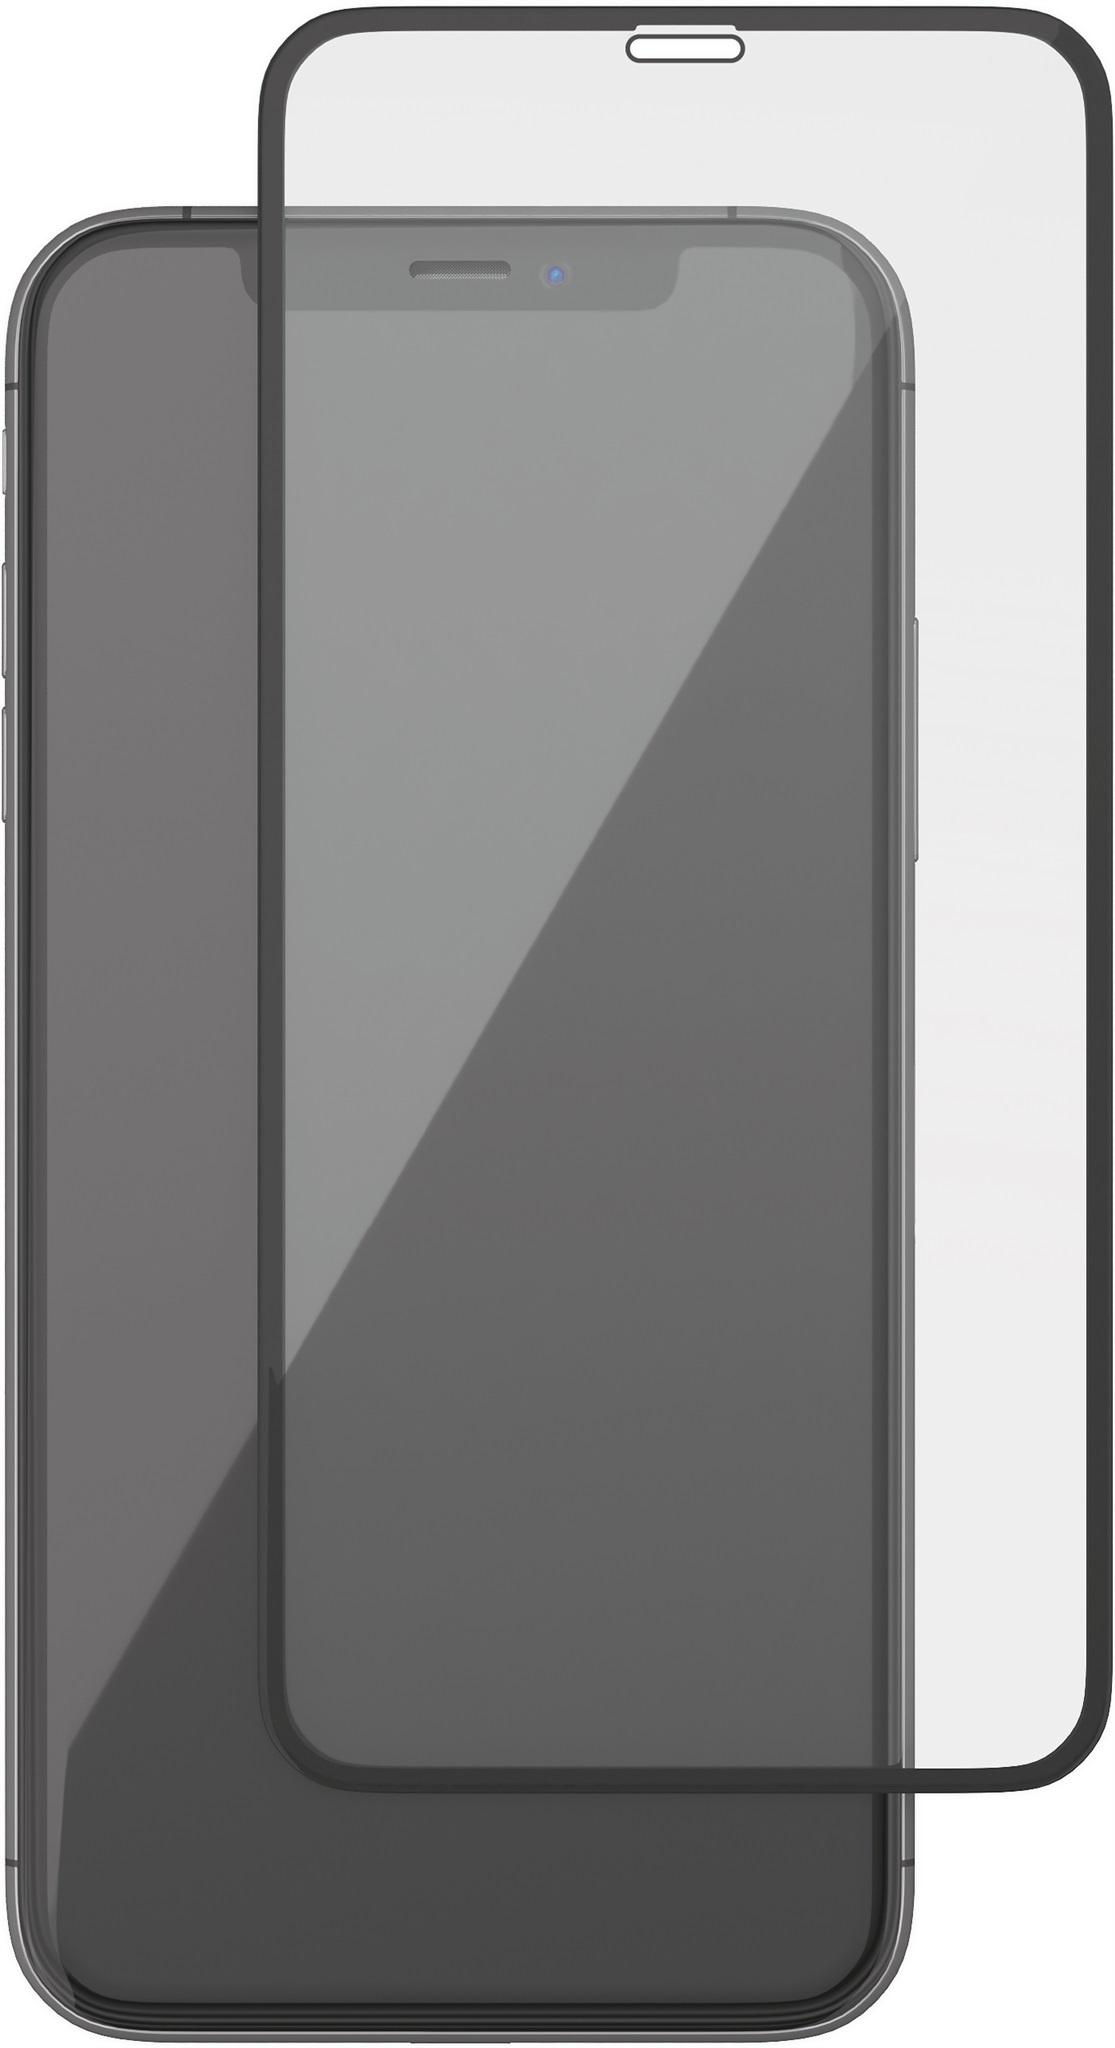 Защитное стекло uBear 3D Full Screen Premium Glas для iPhone Xs Max, черный цена и фото